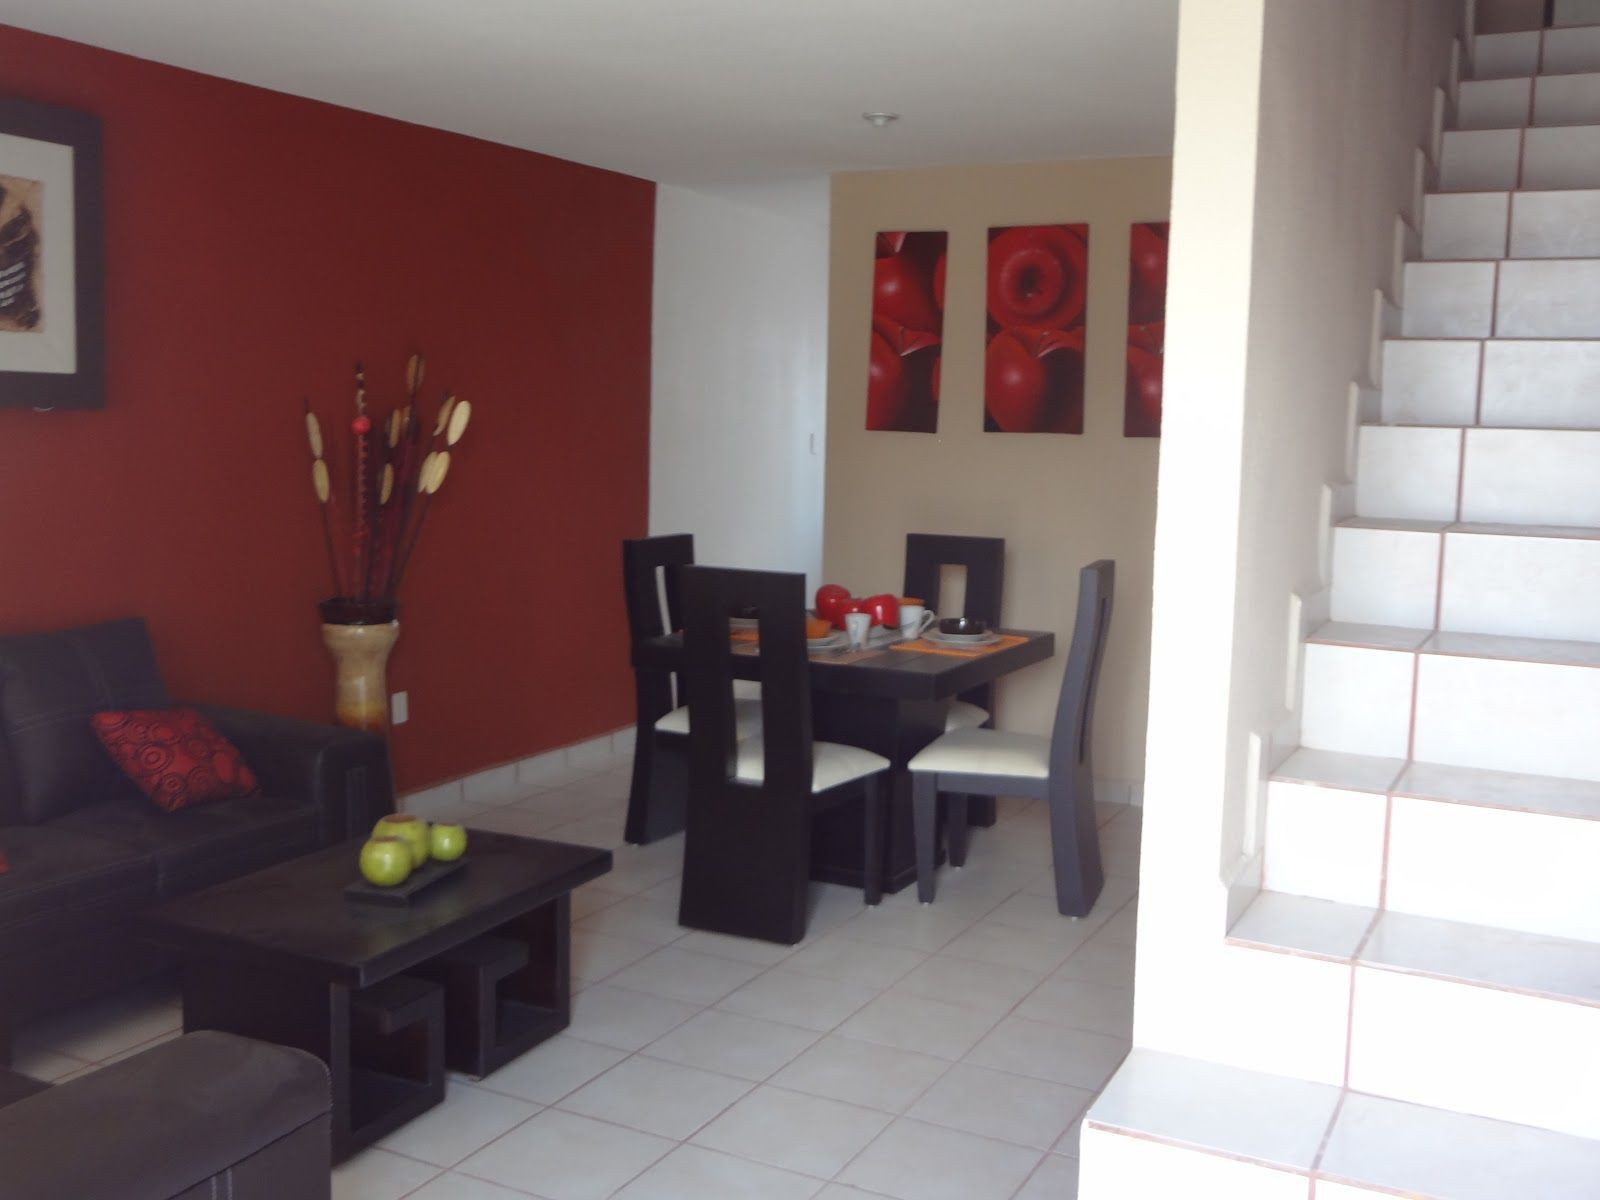 Decoracion de casas tipo infonavit para imprimir gratis 9 for Decoracion decoracion de interiores